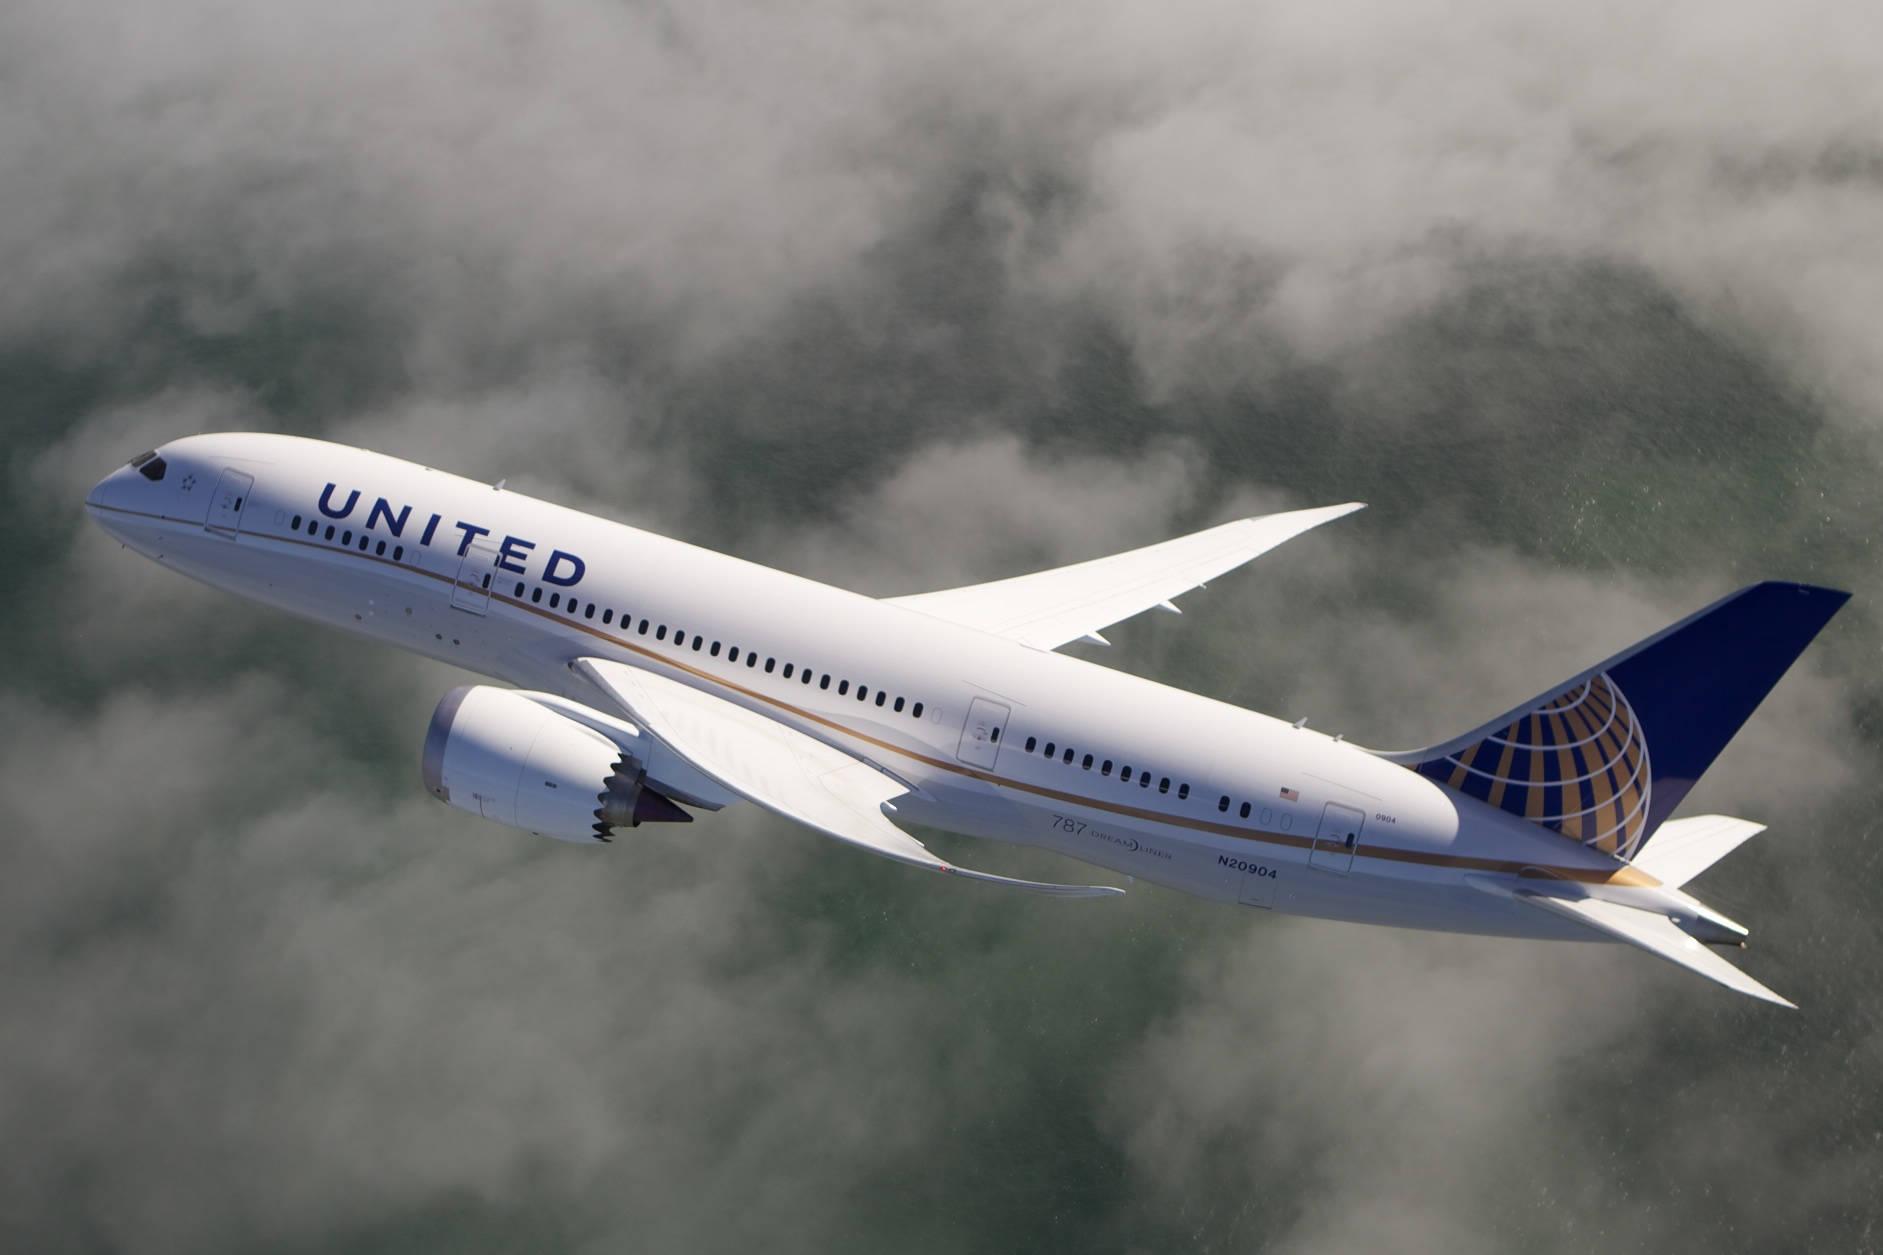 ba63303ffce359747d3c_United_787_Dreamliner_Clouds.jpg